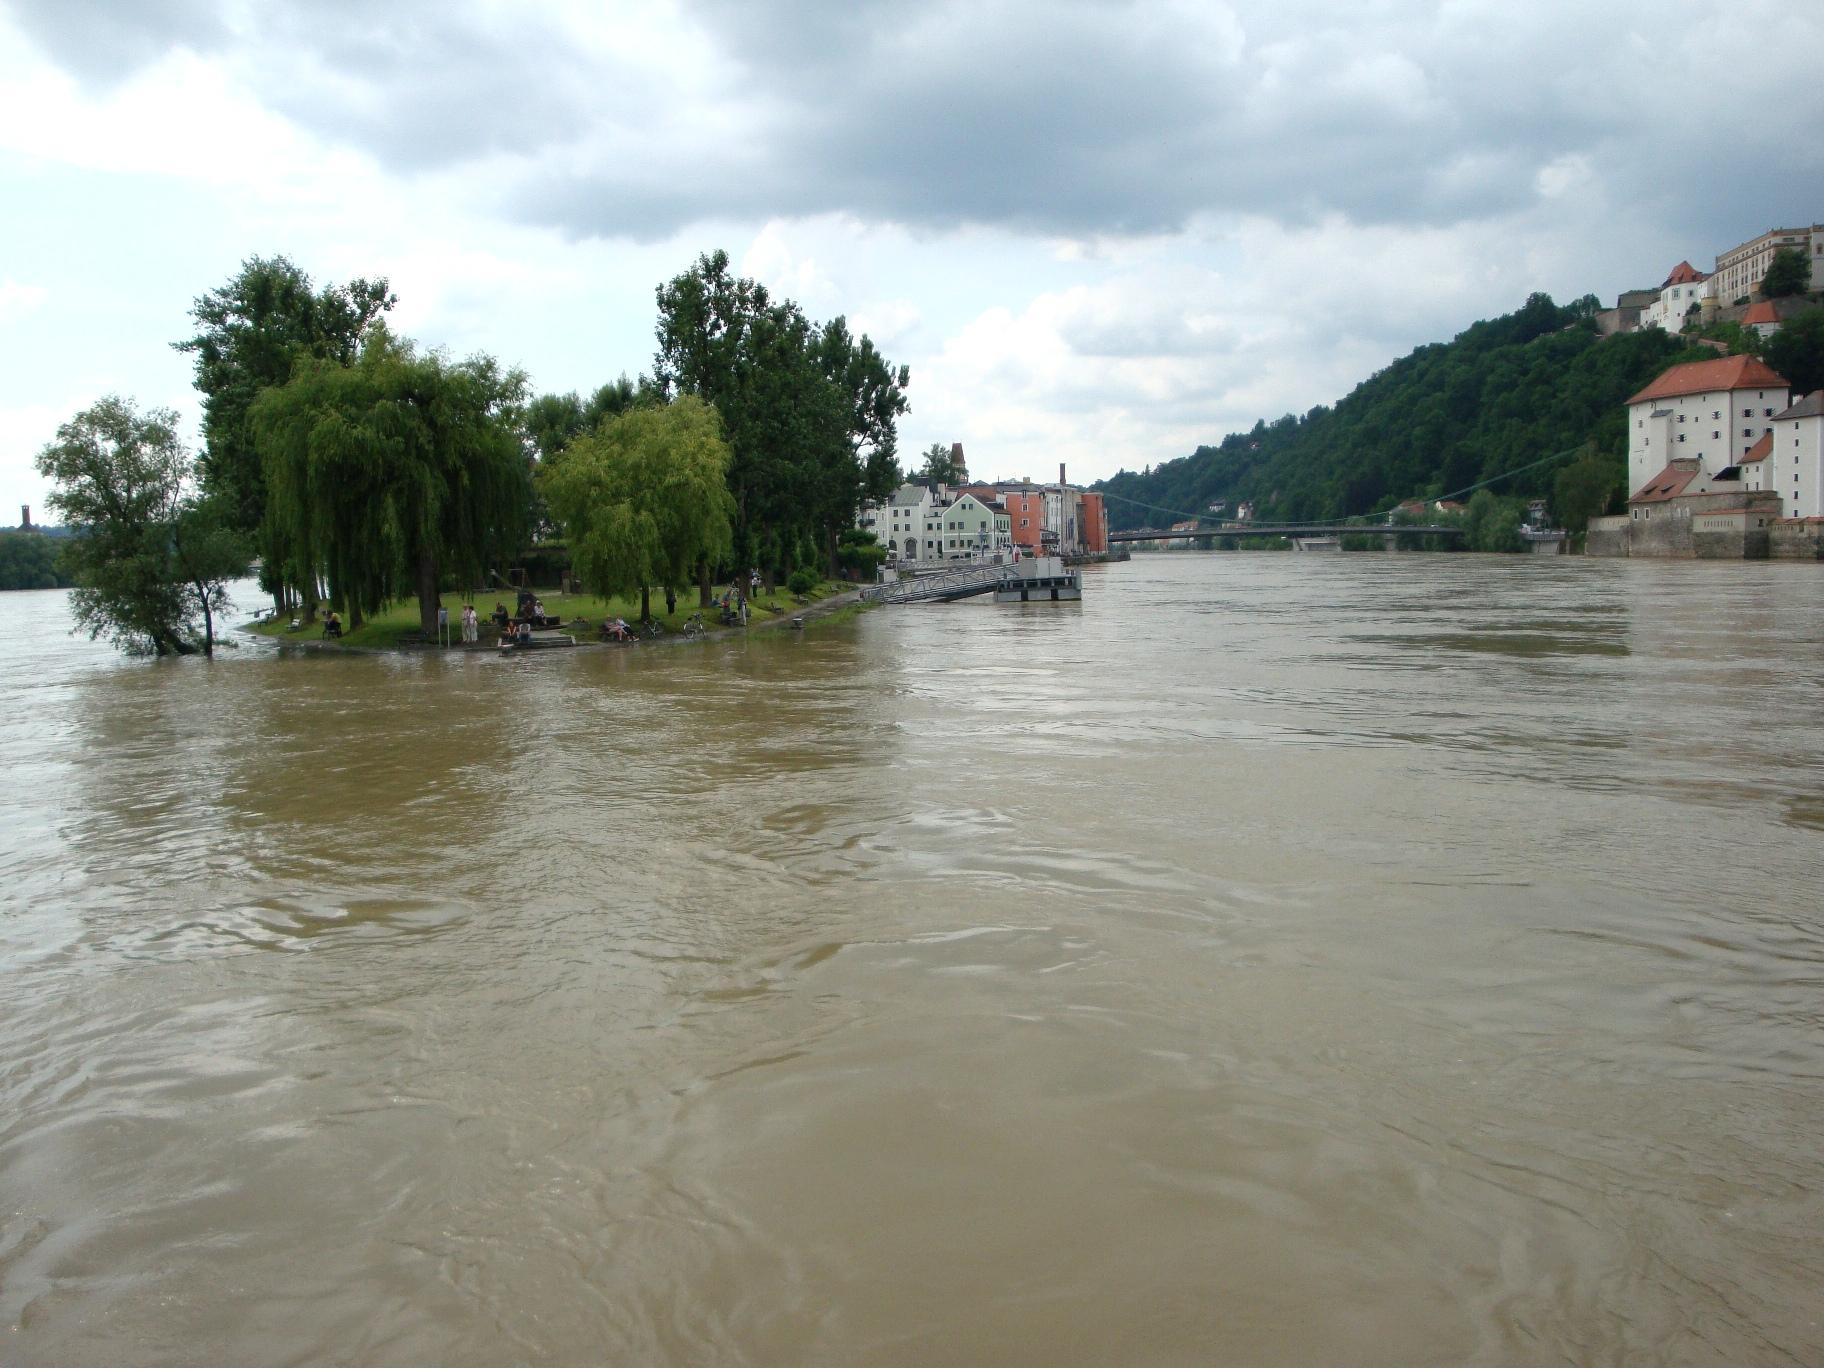 UK floods: Large companies pledge over 250m